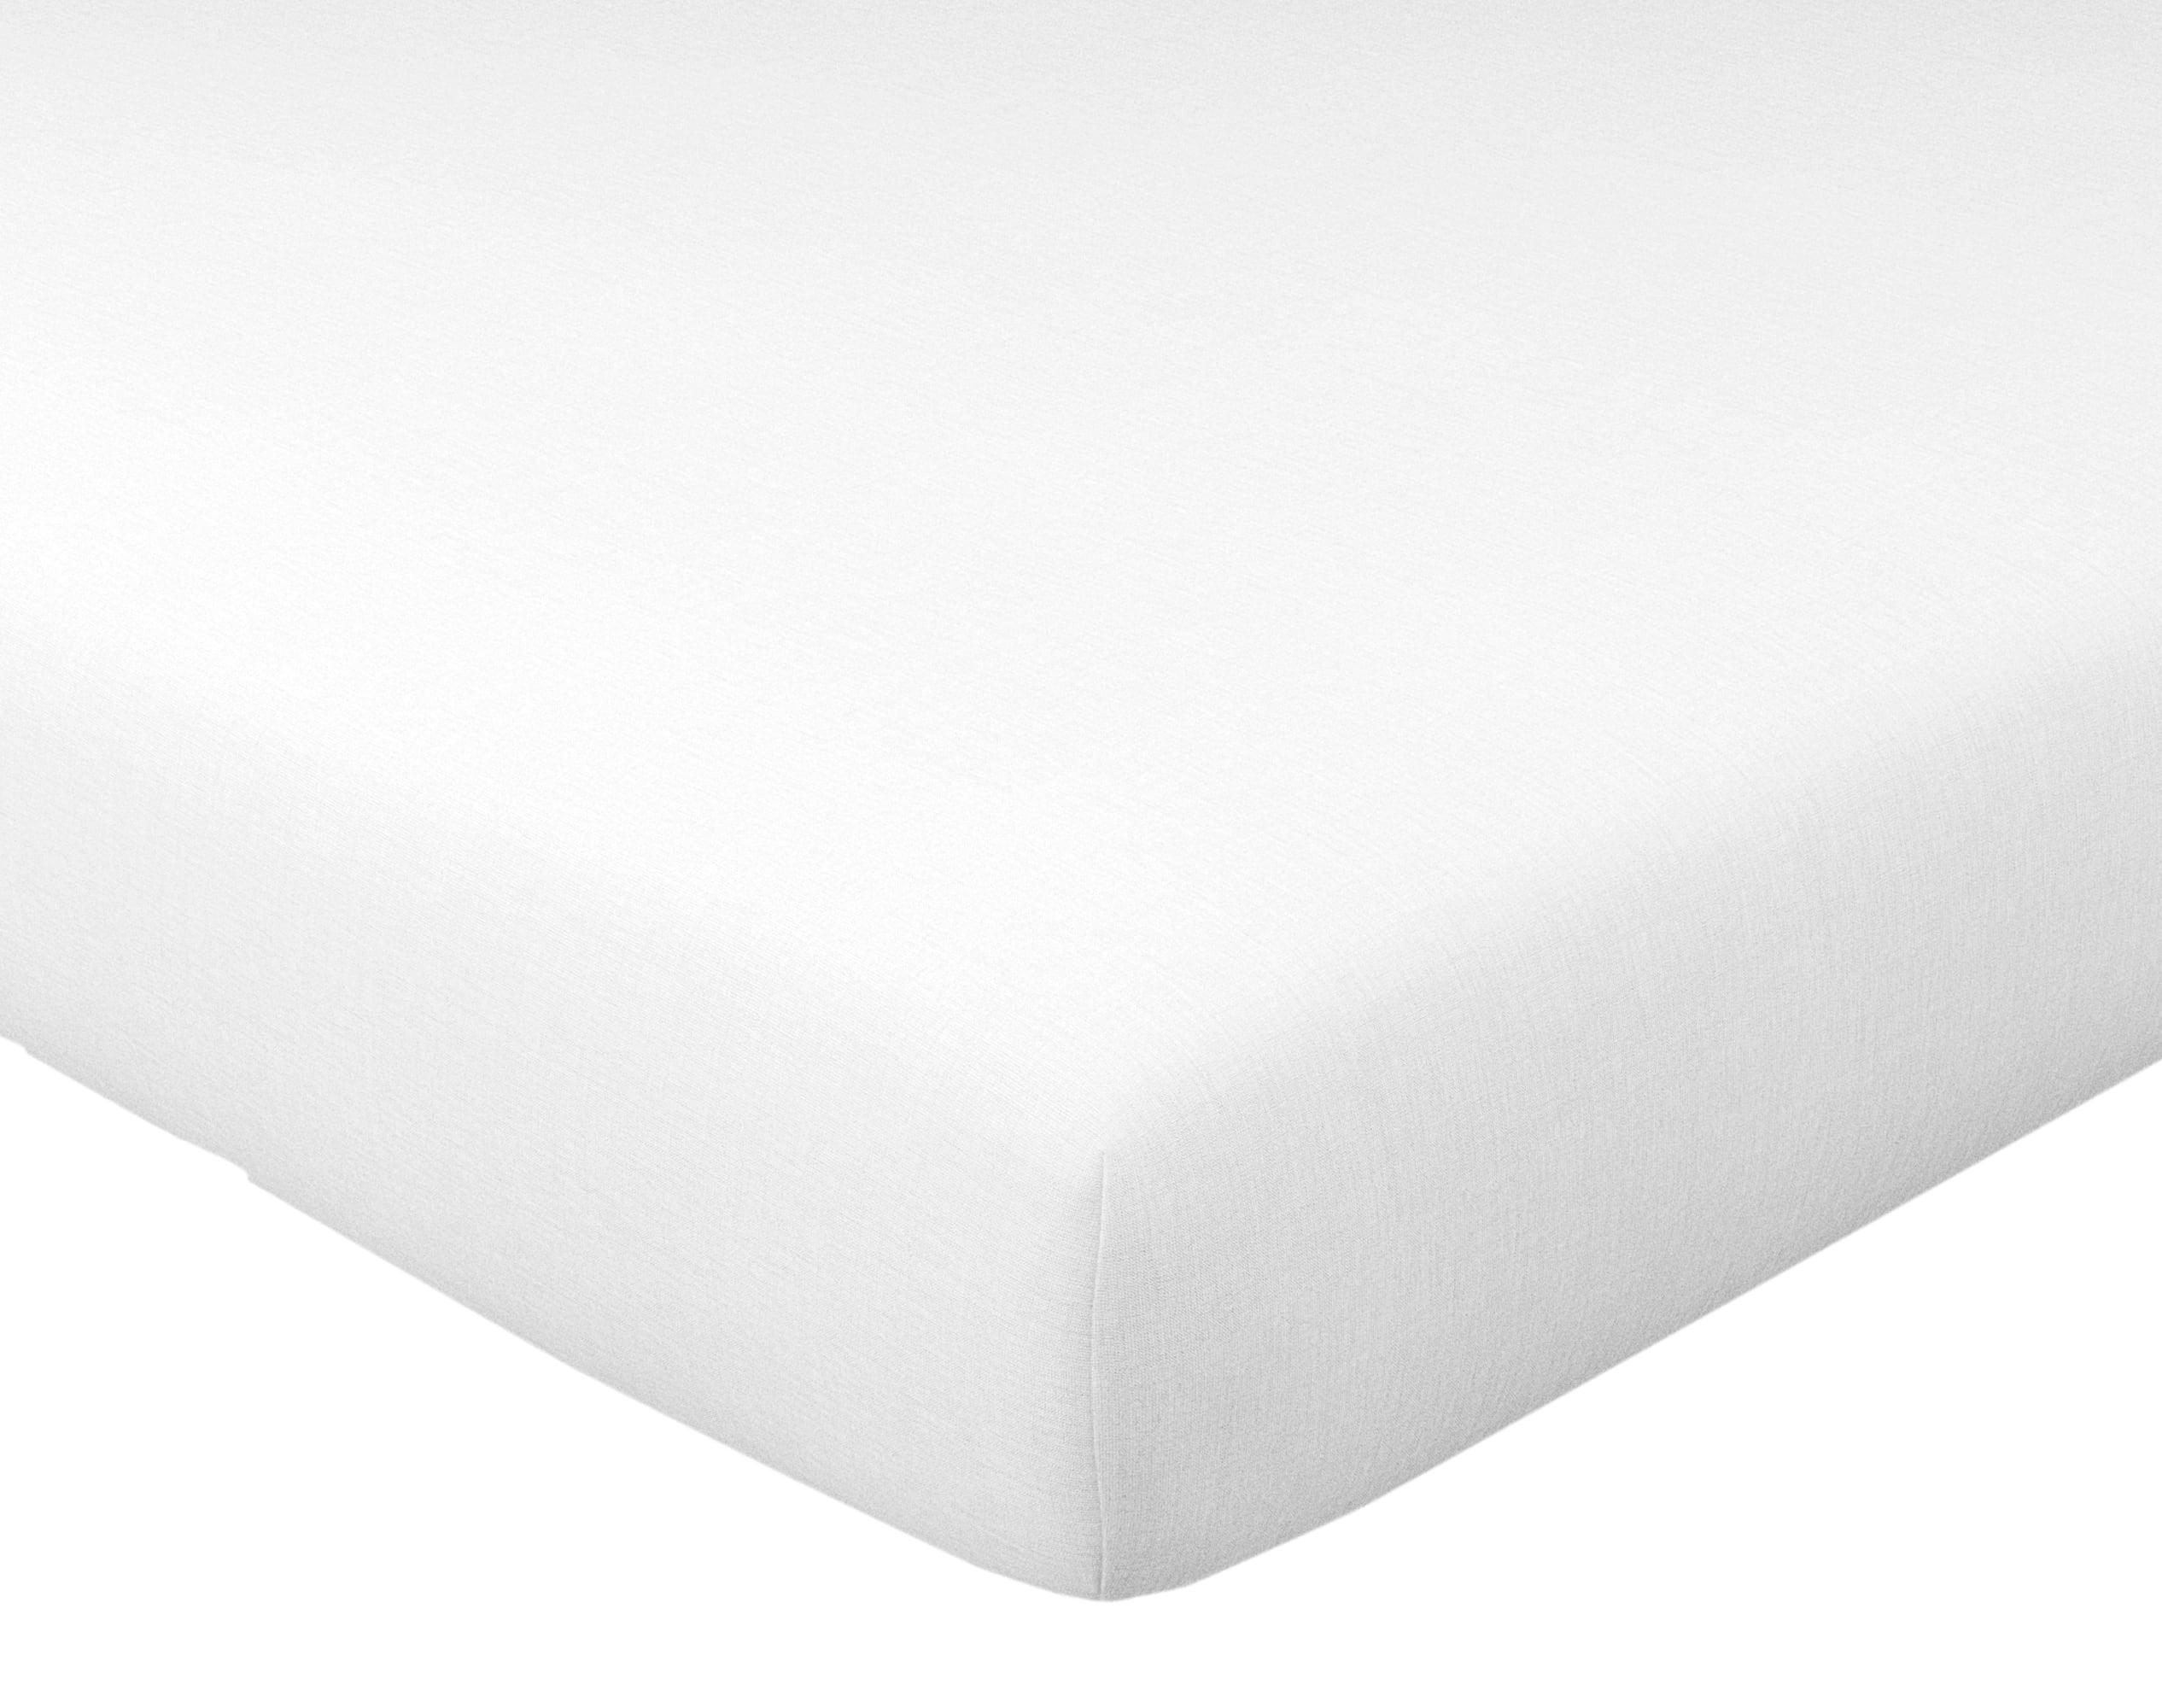 Drap-housse 90x190 en lin lavé blanc